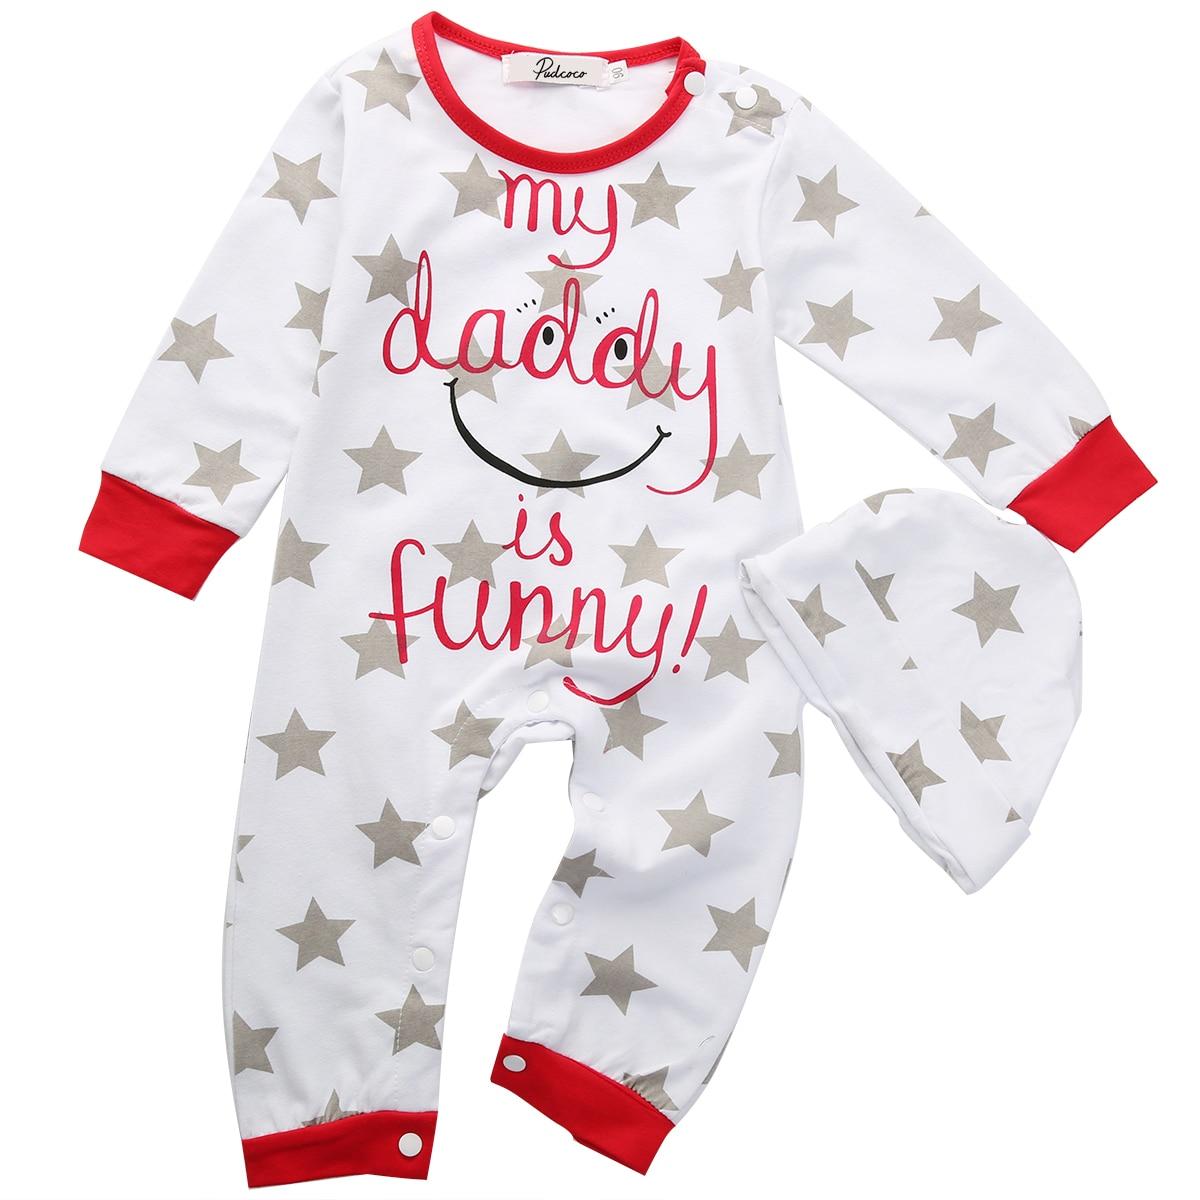 db9e23881 2pcs Baby Boy Girl clothes Mum Dad Newborn Infant Romper Hat ...